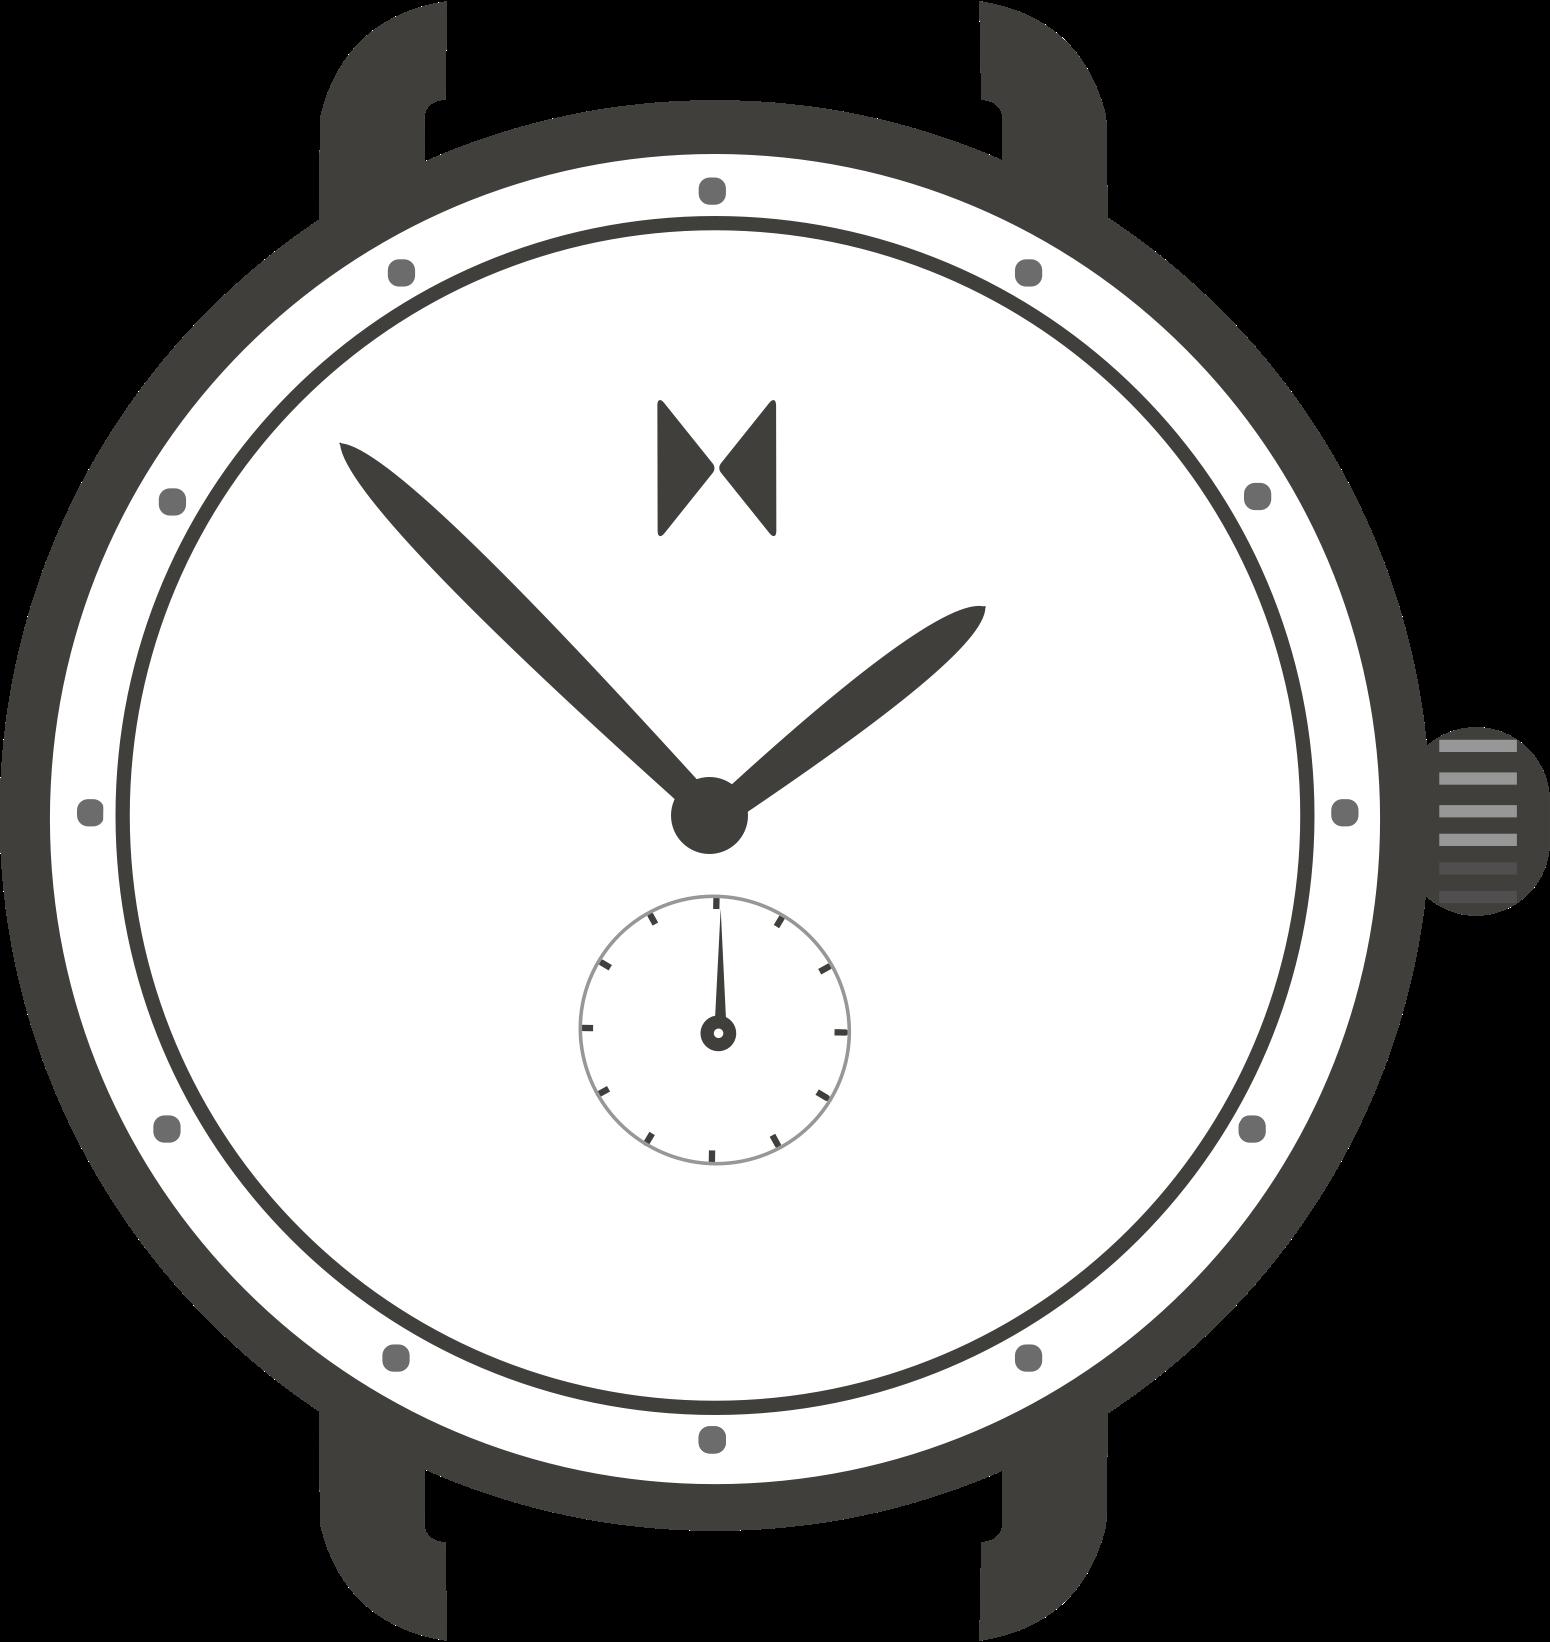 Bloom watch illustration